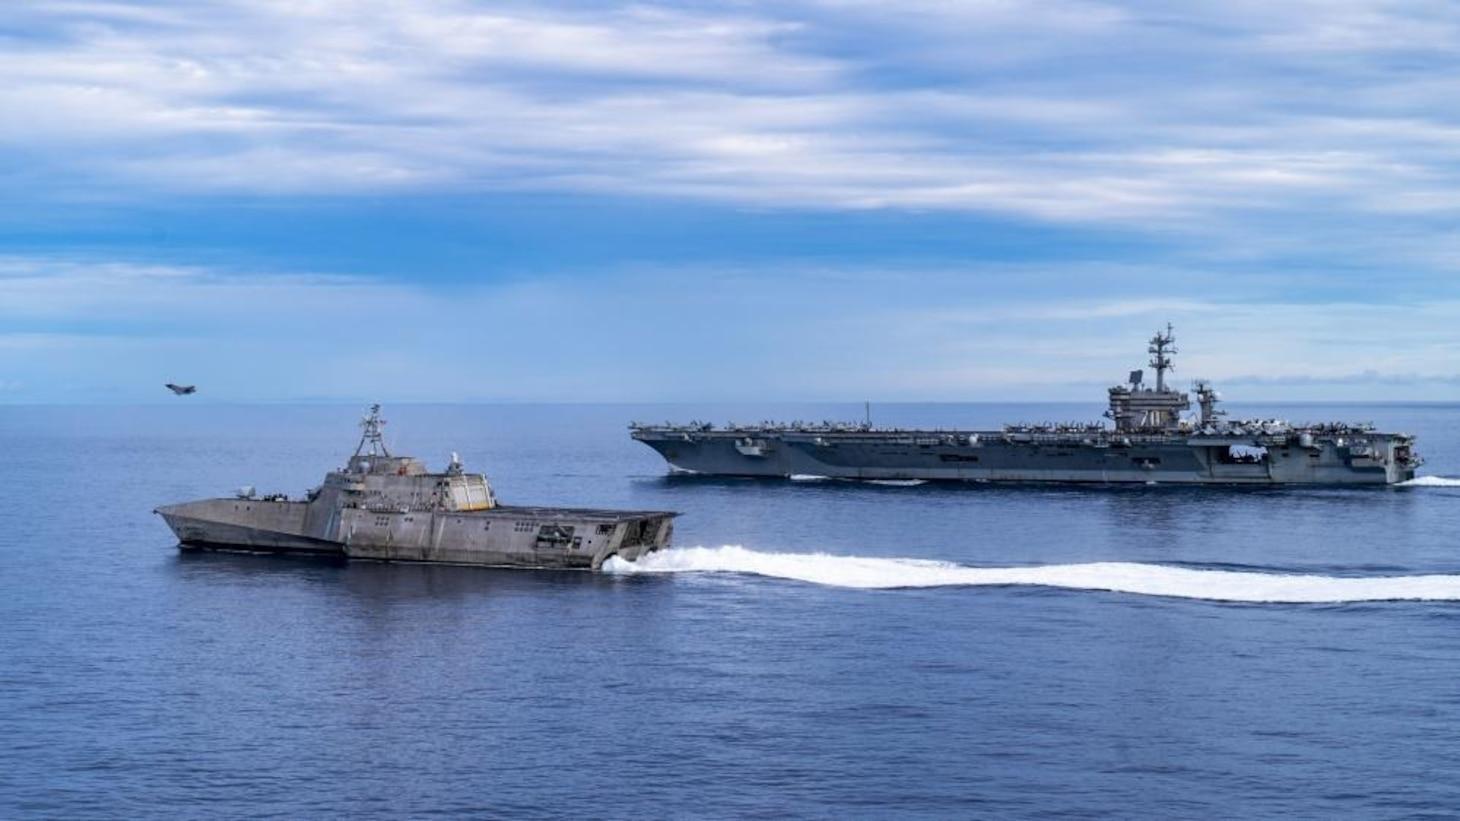 USS Carl Vinson (CVN 70) Transits South China Sea with USS Tulsa (LCS 16)